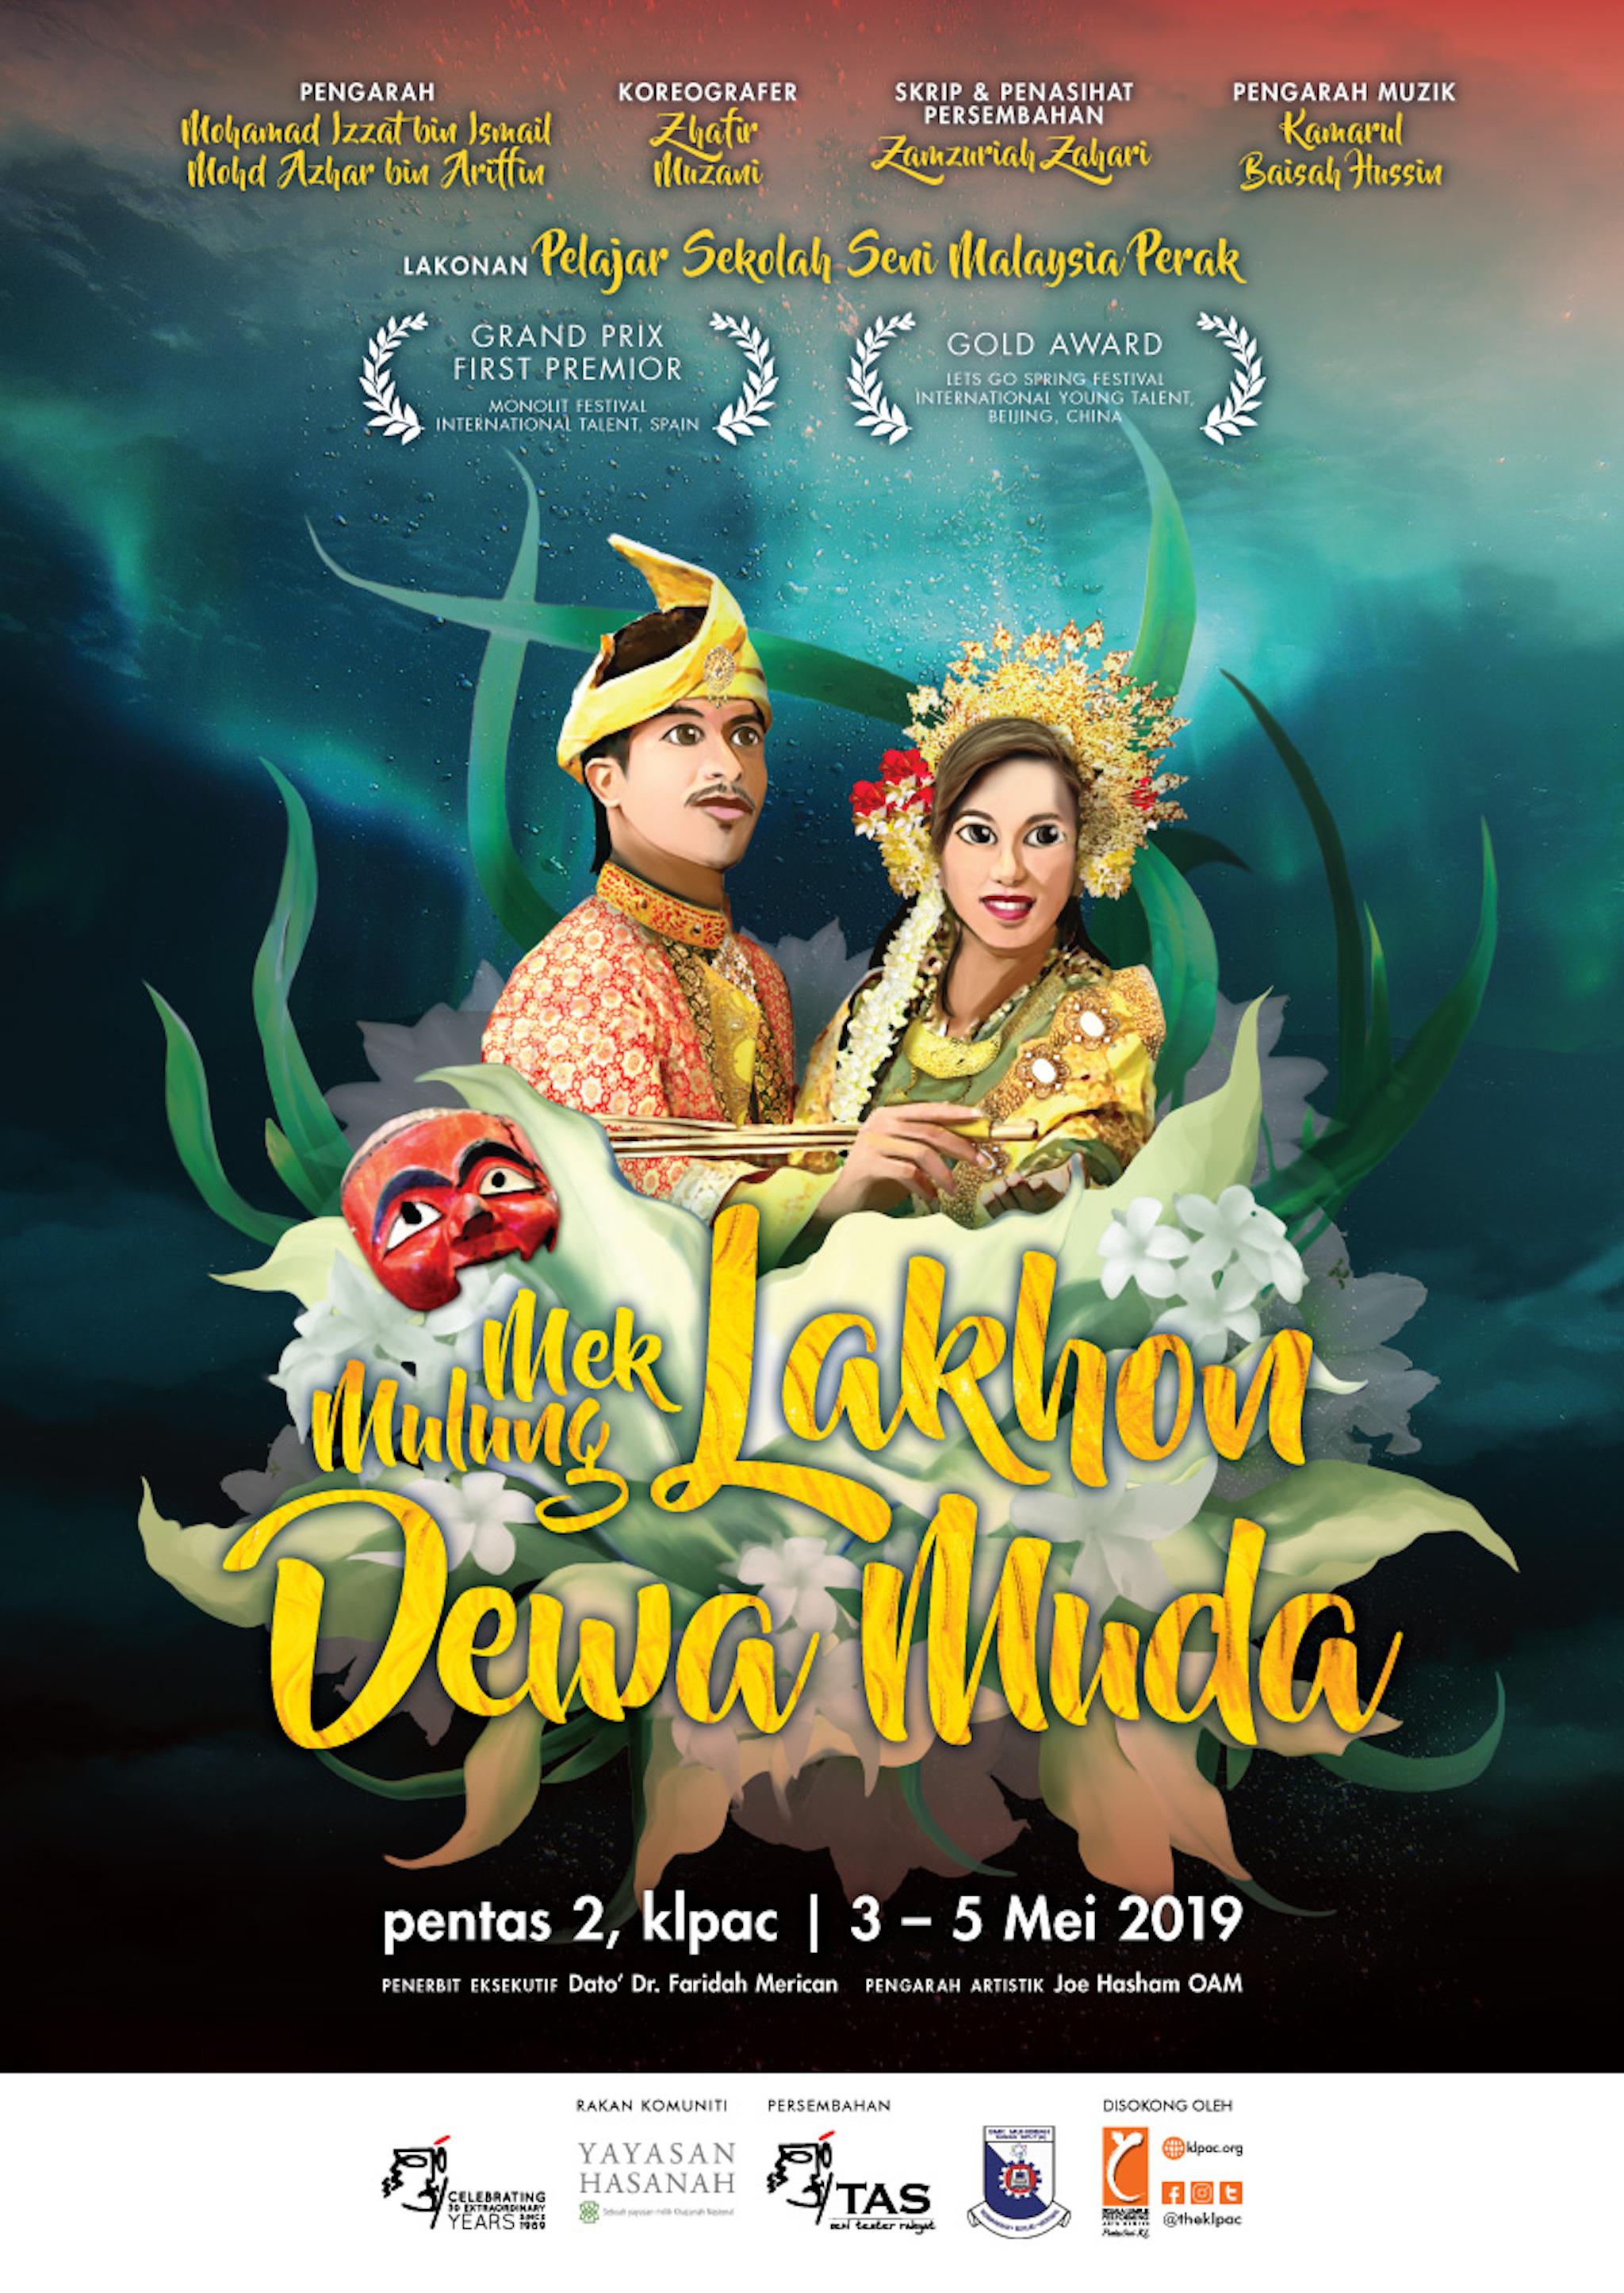 2019 Mek Mulung Lakhon Dewa Muda cover